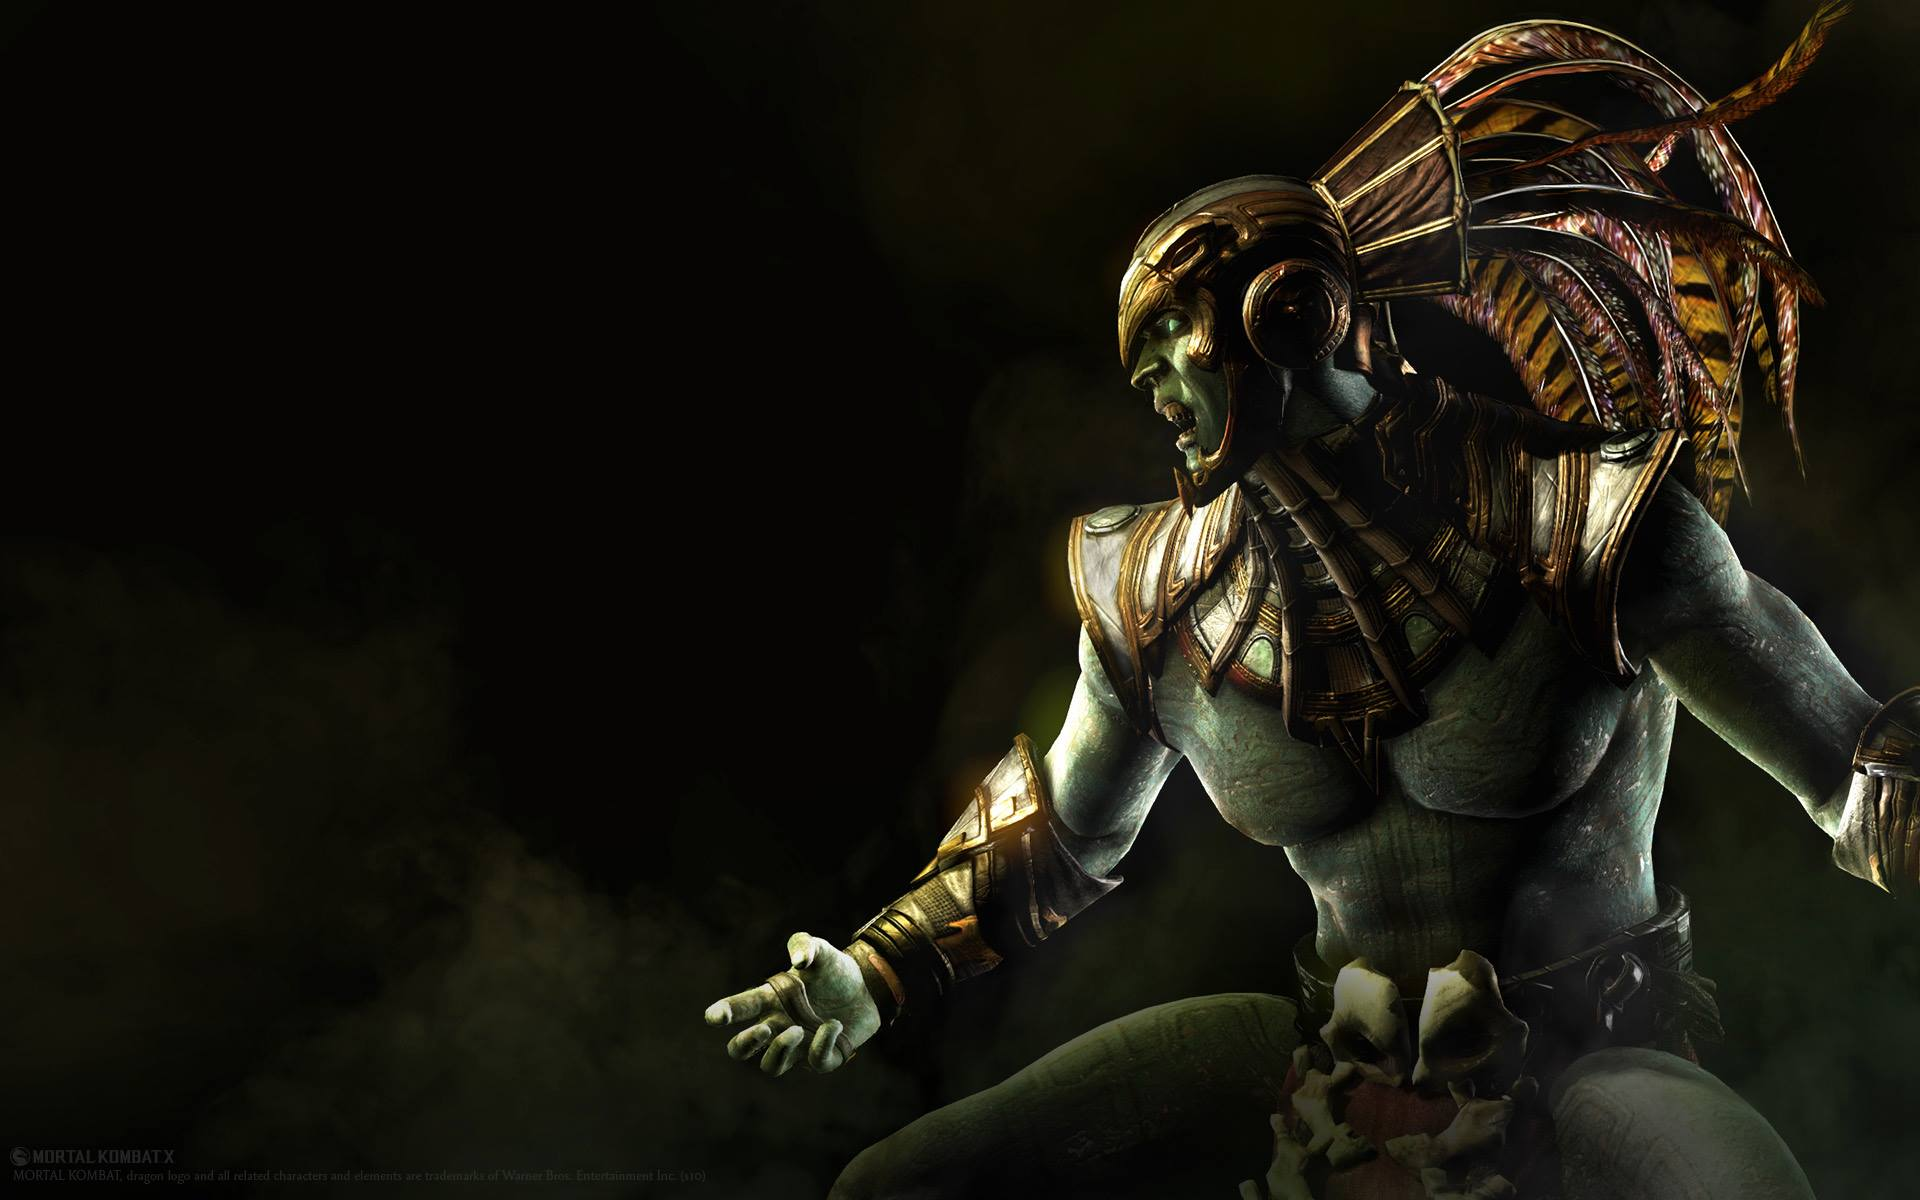 Kotal Kahn Mortal Kombat X Hd Wallpaper